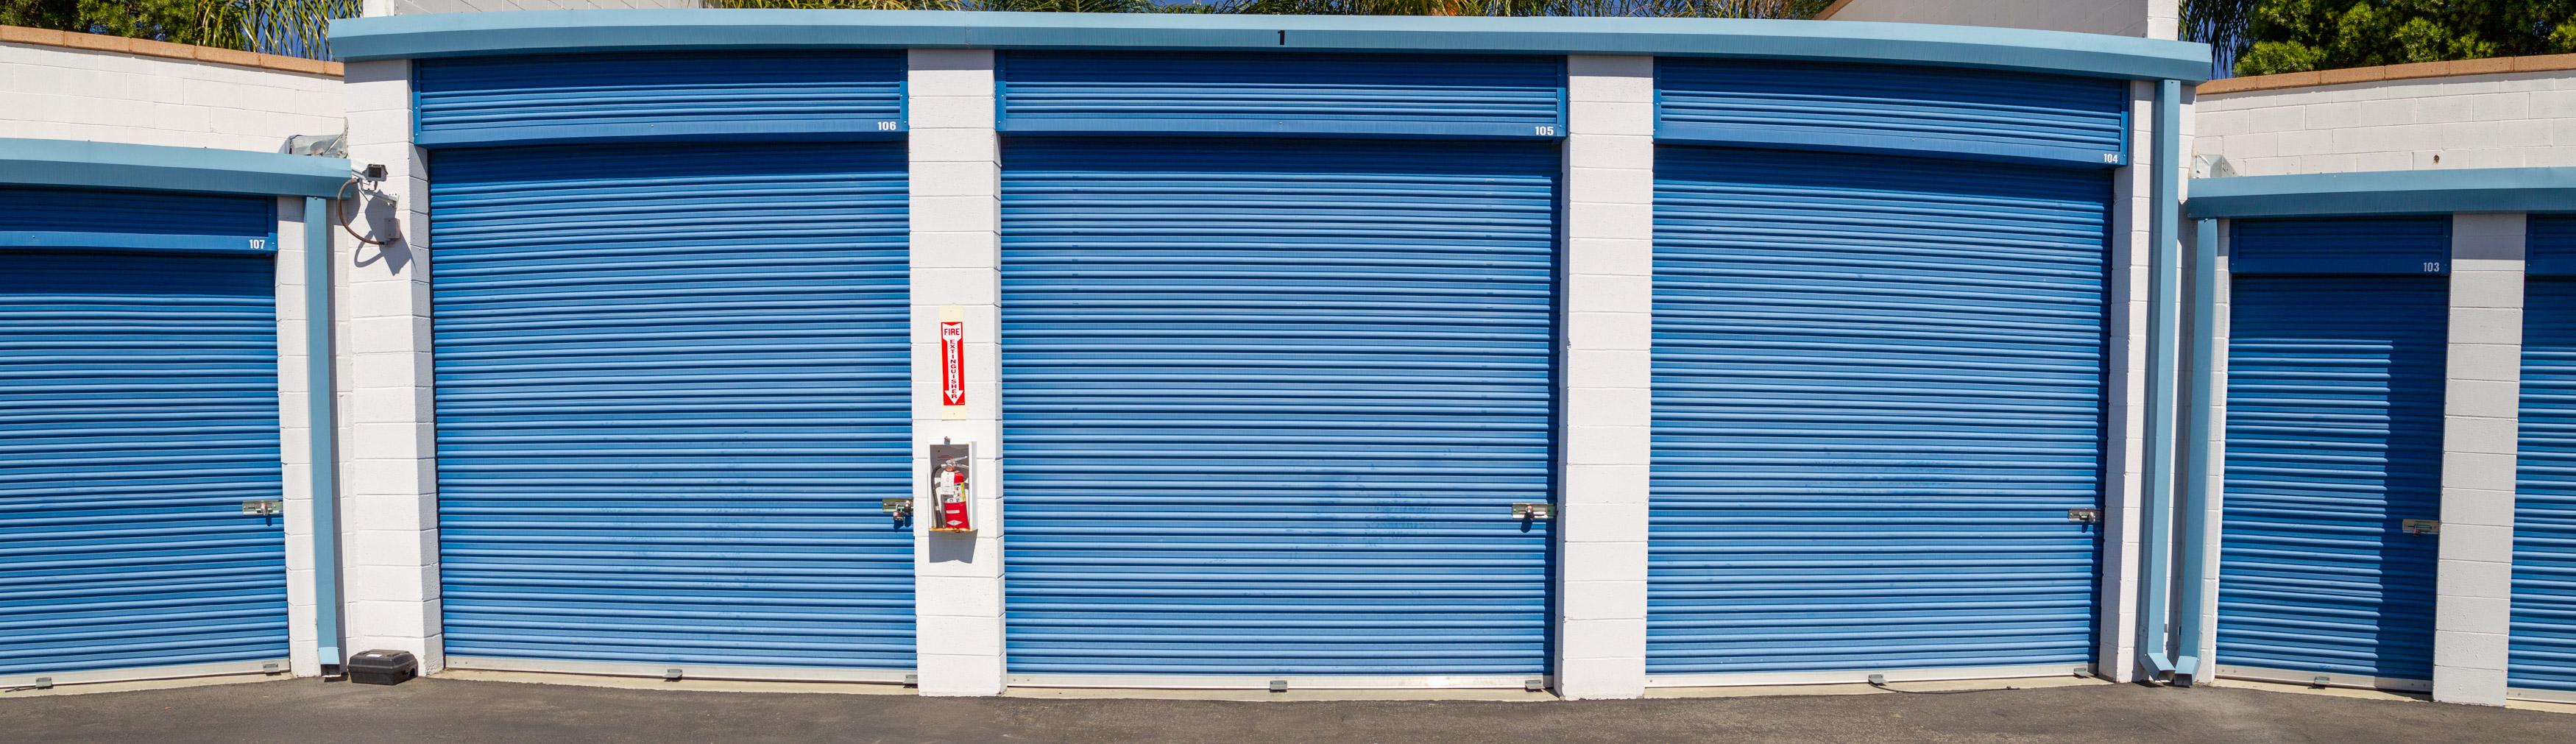 Secure Storage in Temecula, CA